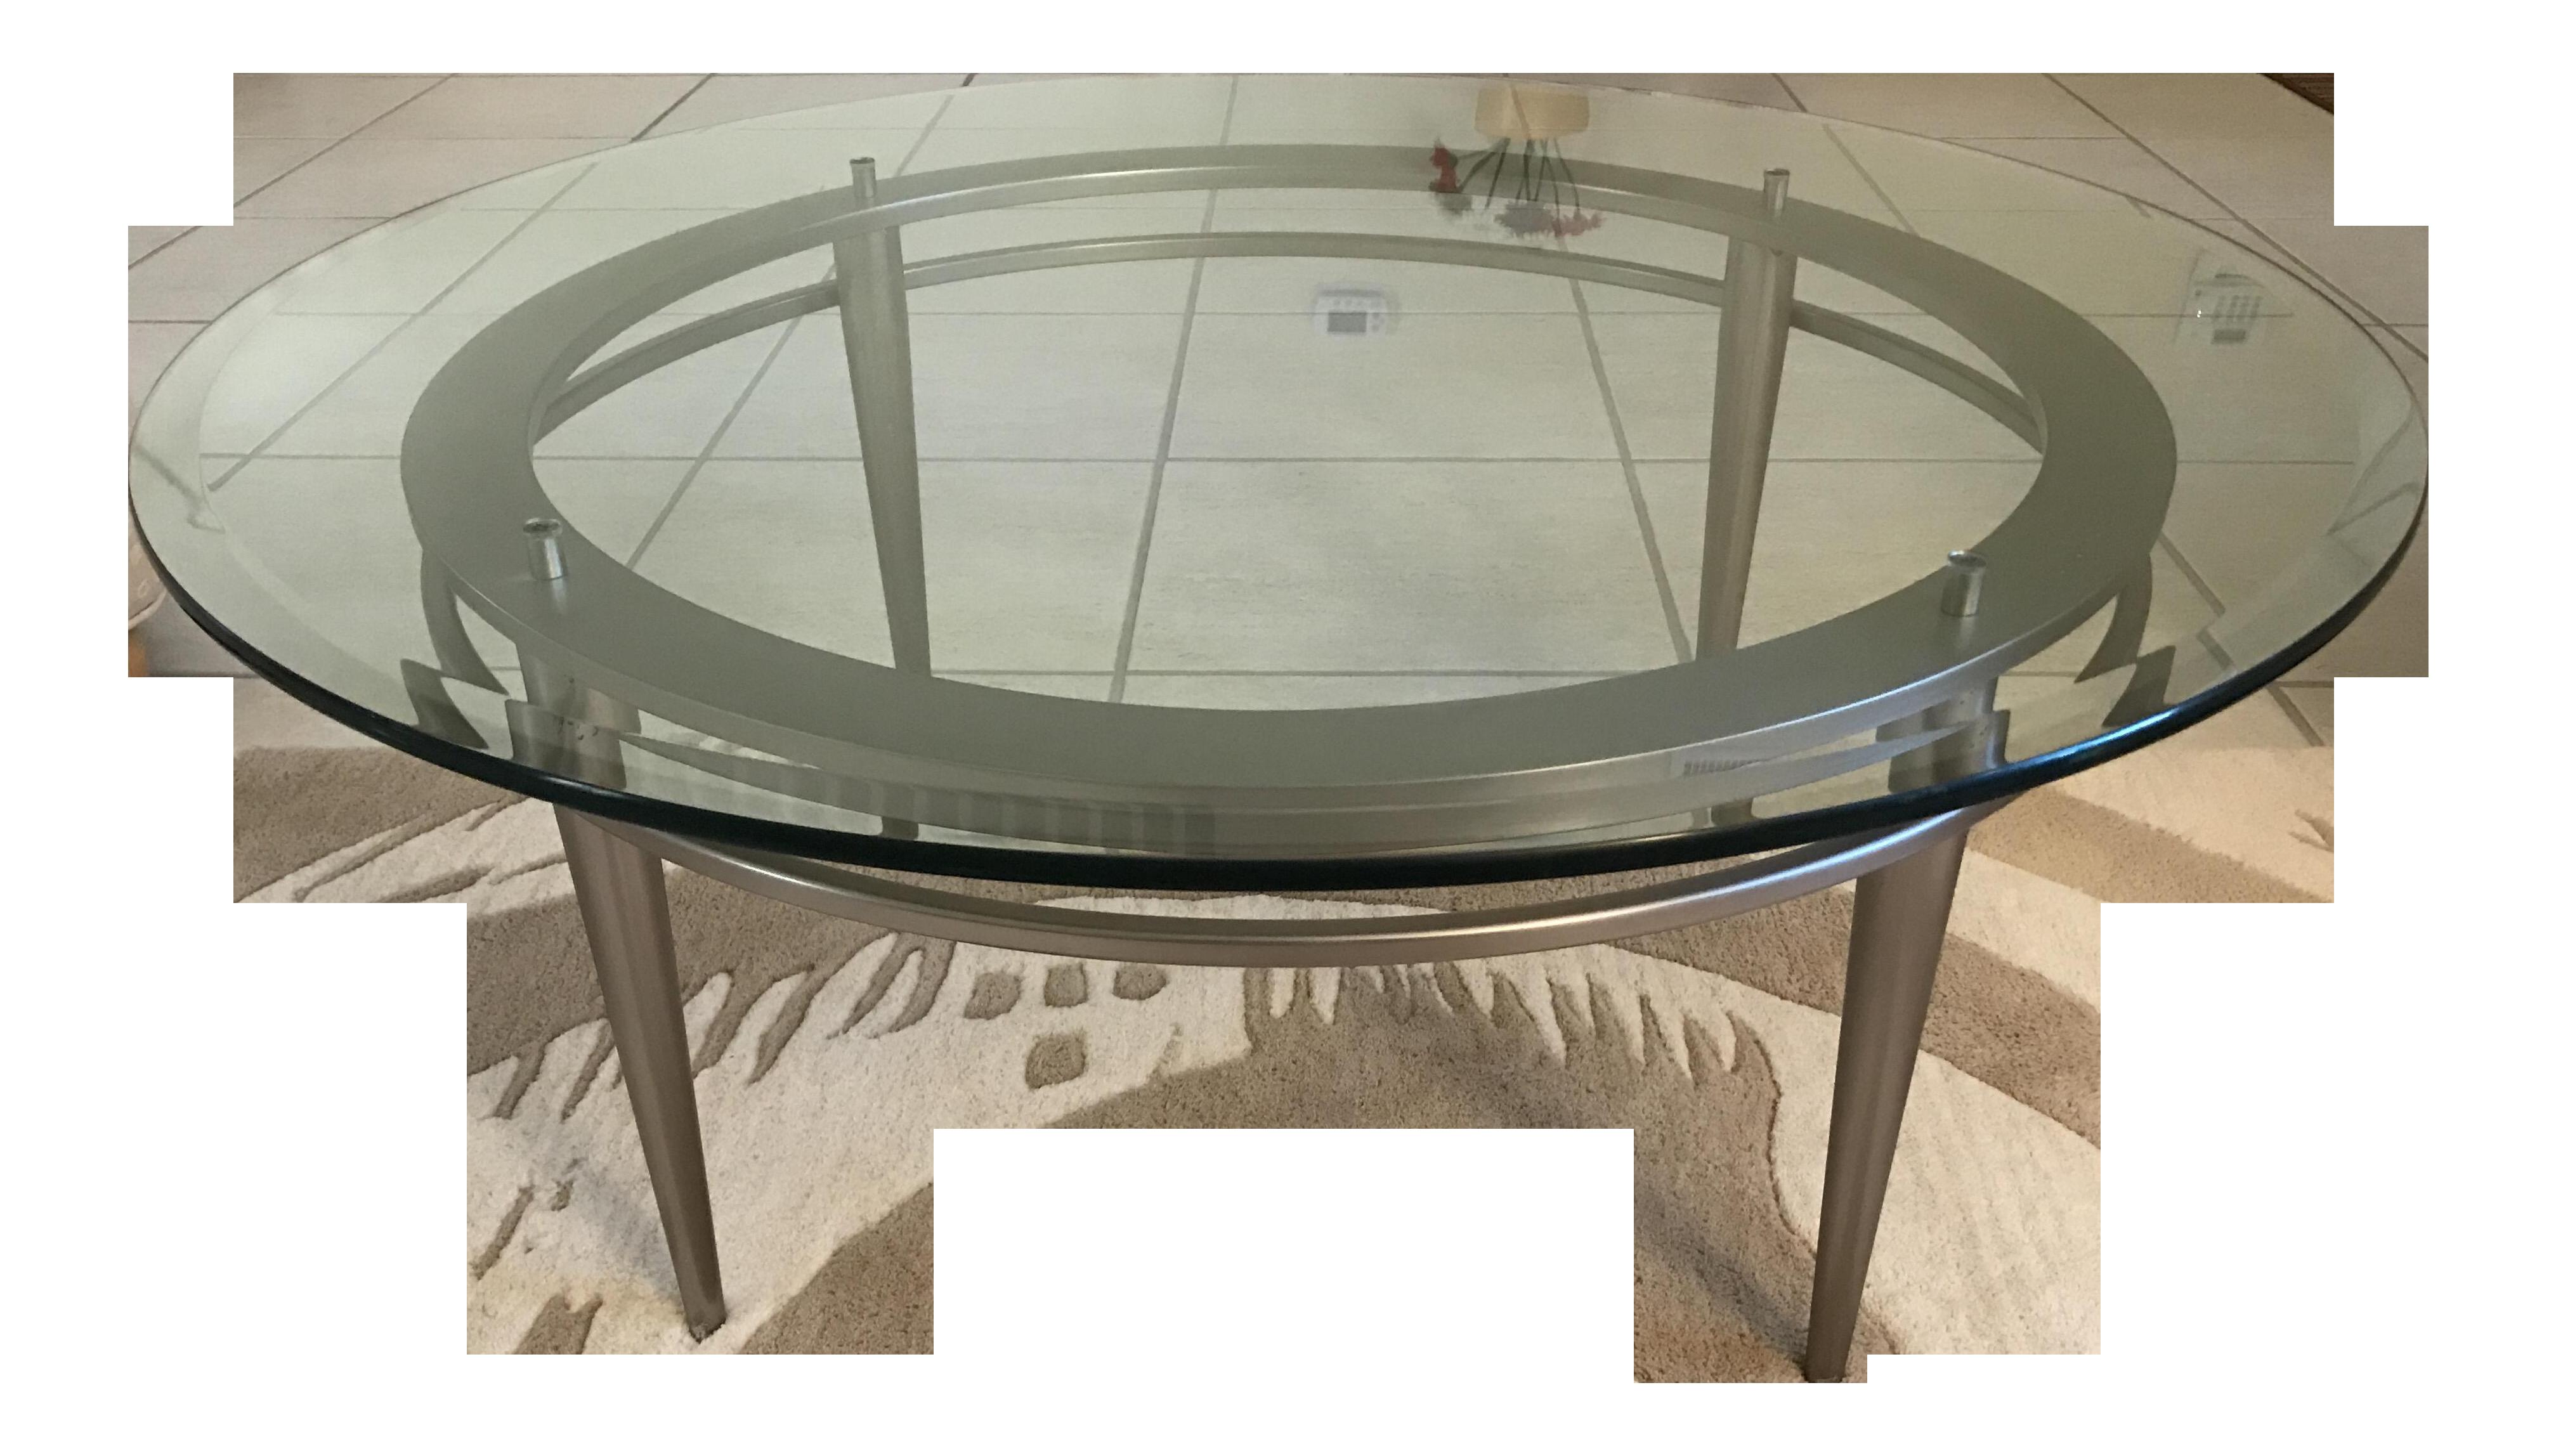 AllClad Stainless Steel Colander Cookware sale, Steel